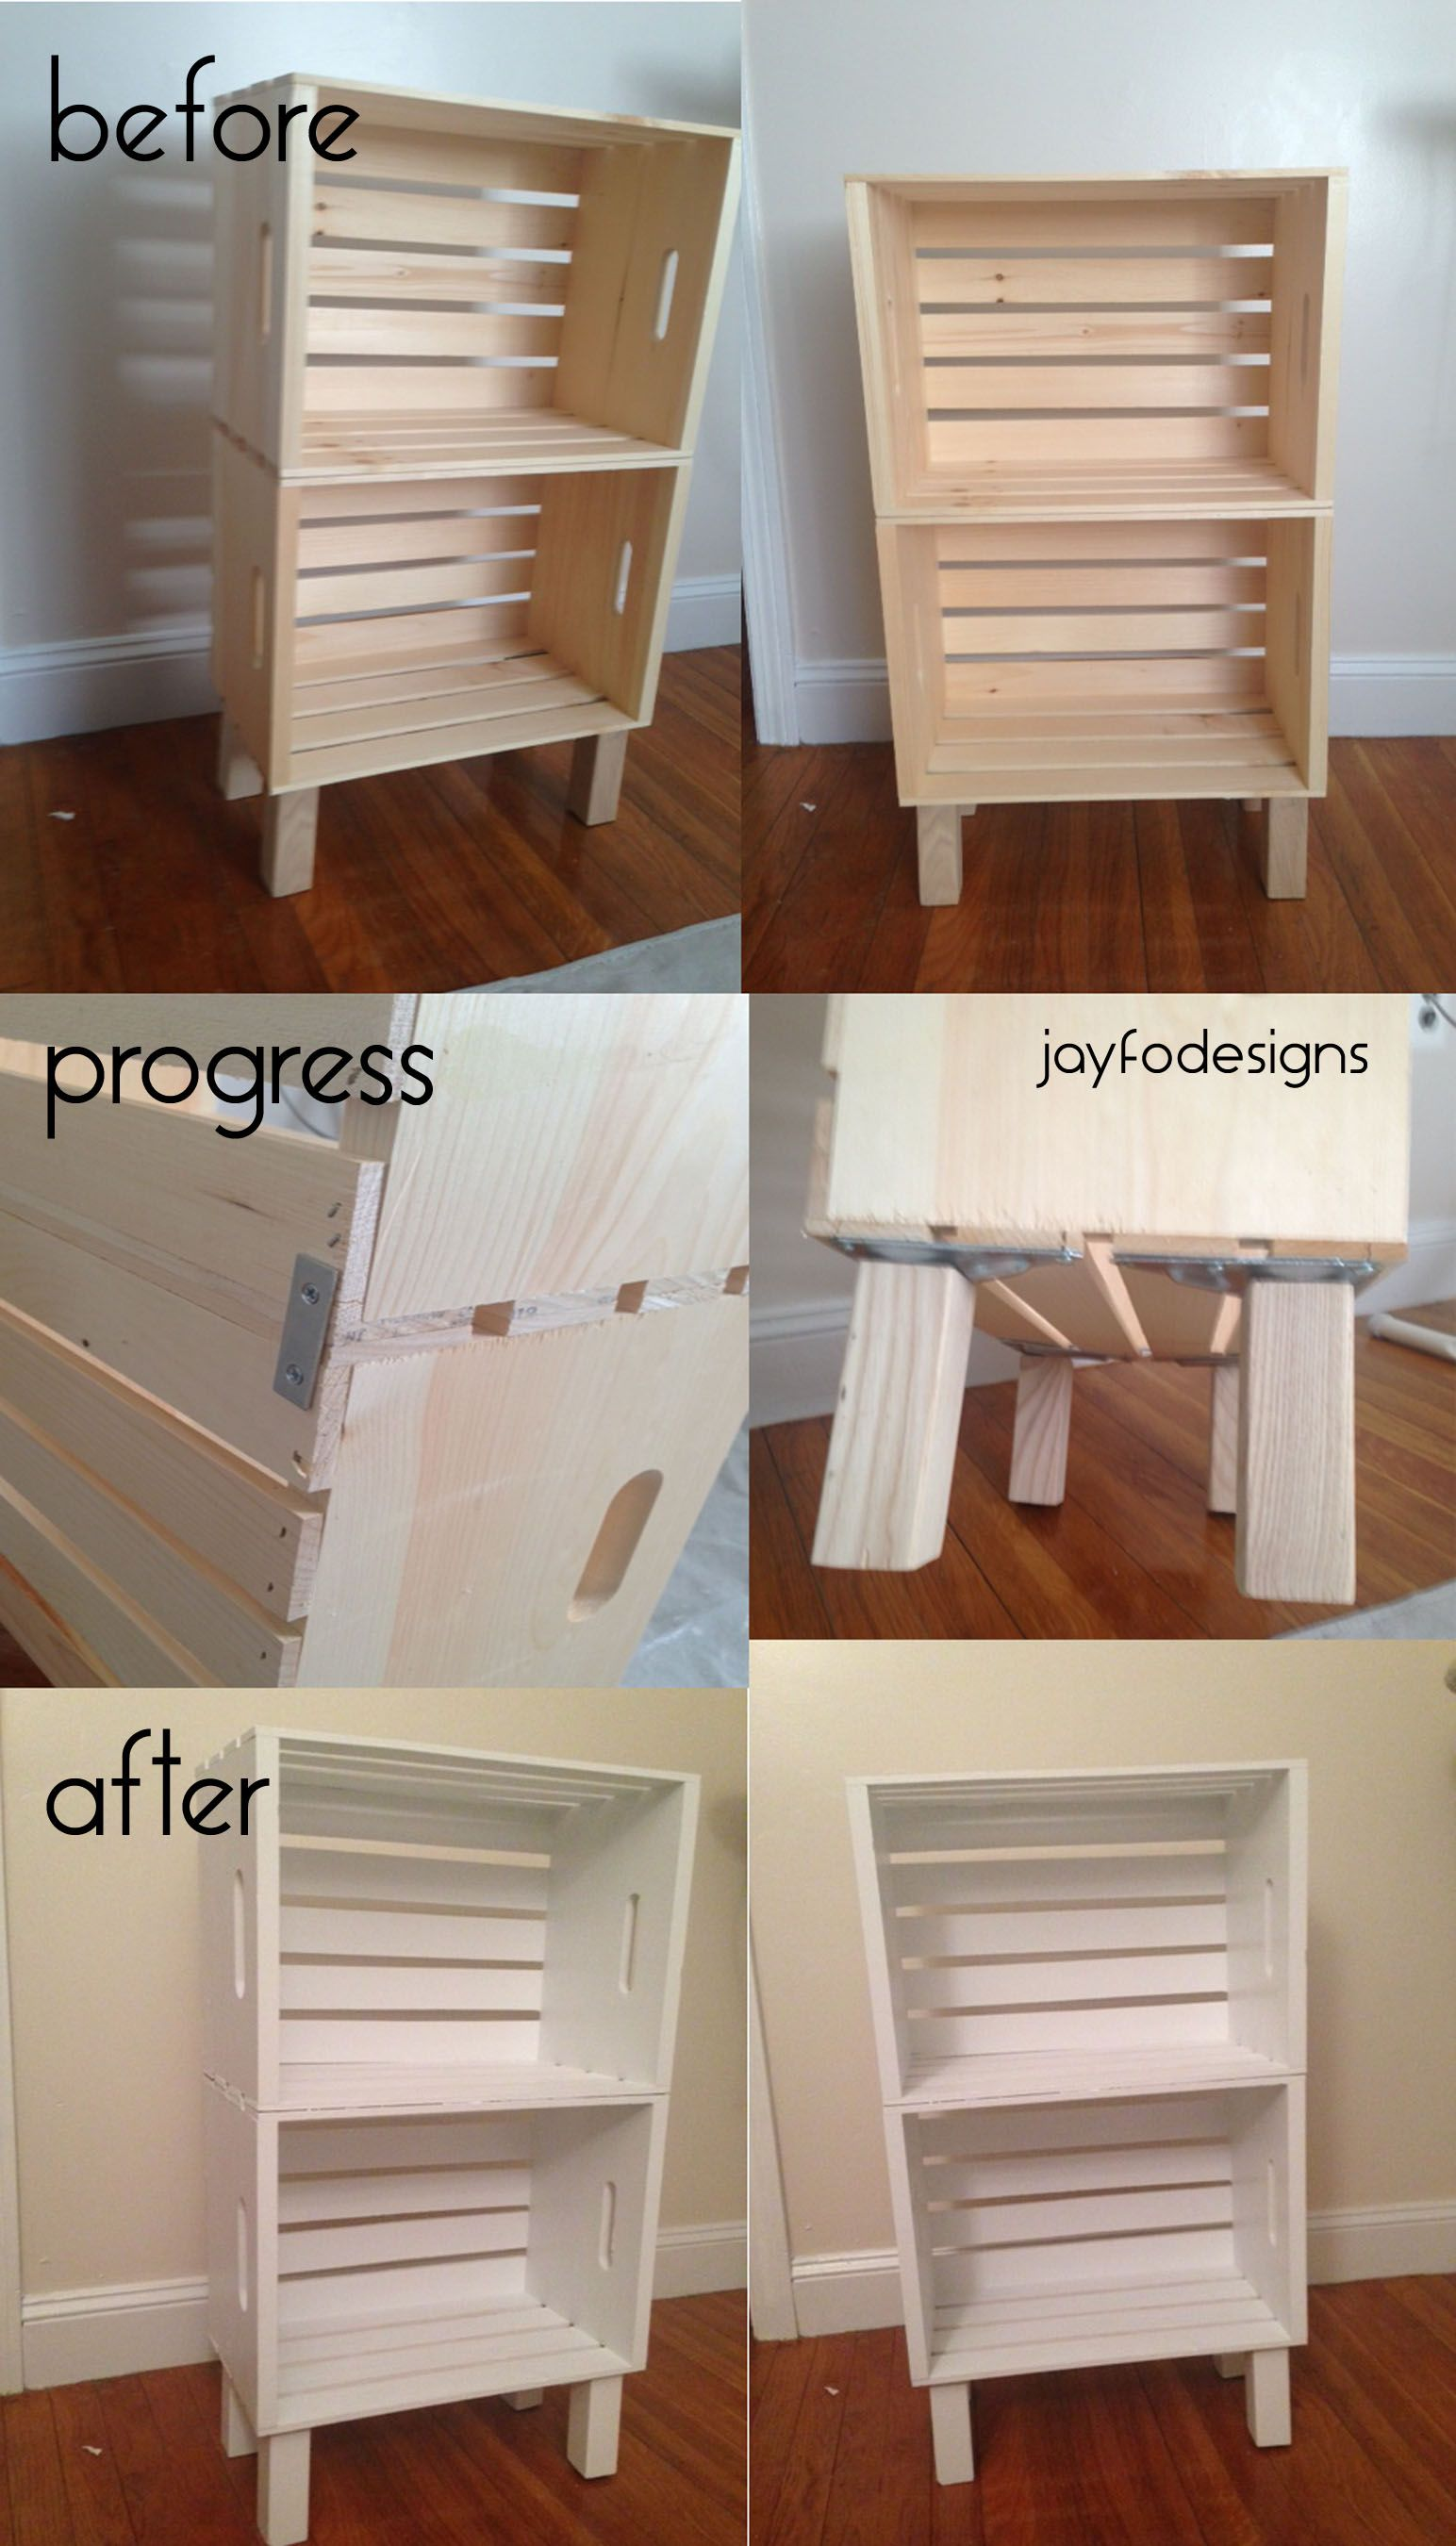 Diy Storage Cases Bookcase Diy Diy Furniture Kids Bedroom Storage